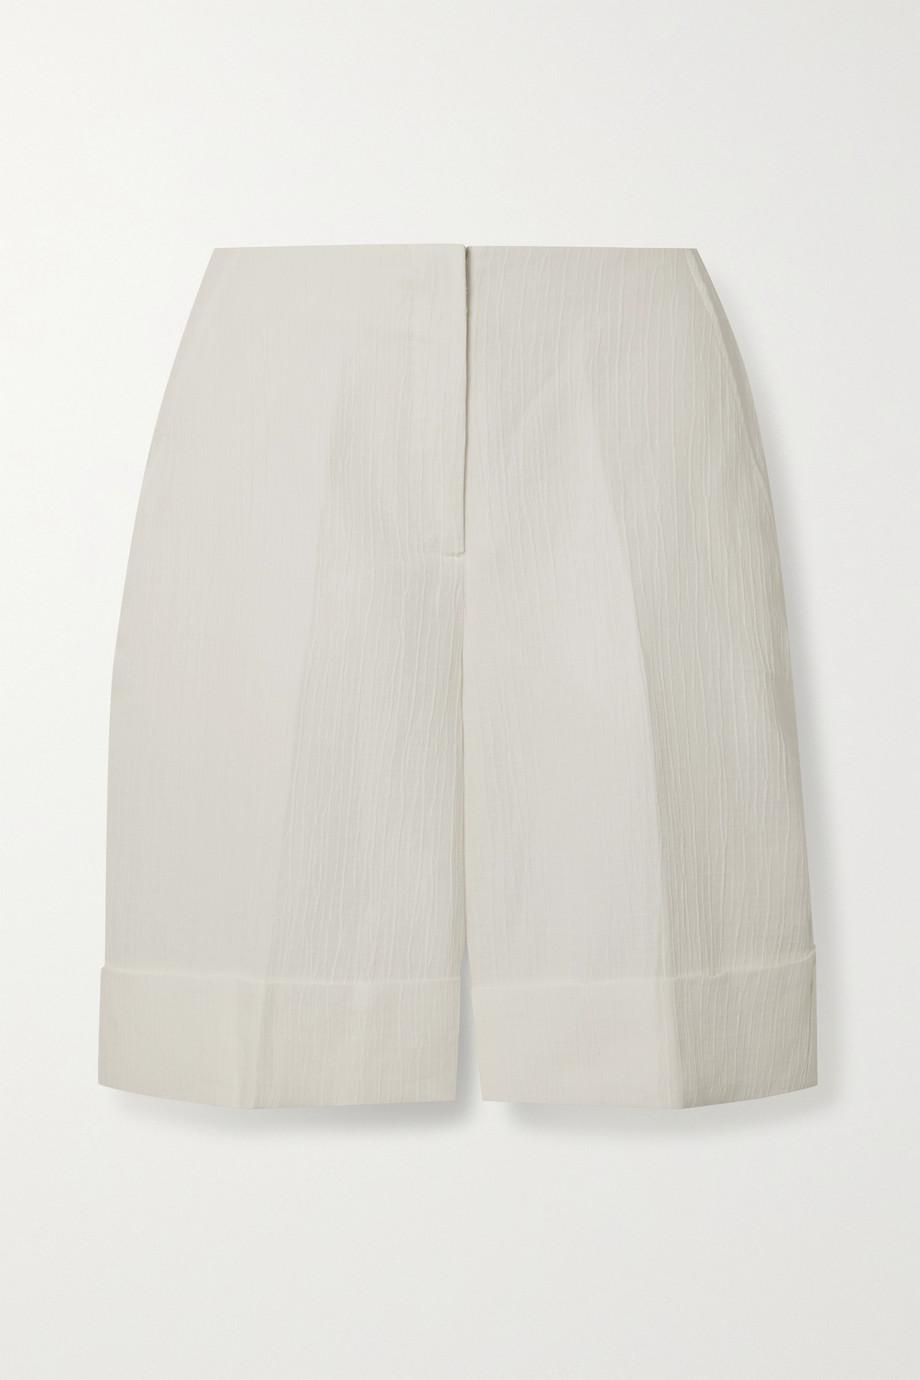 King & Tuckfield + NET SUSTAIN organic jacquard shorts